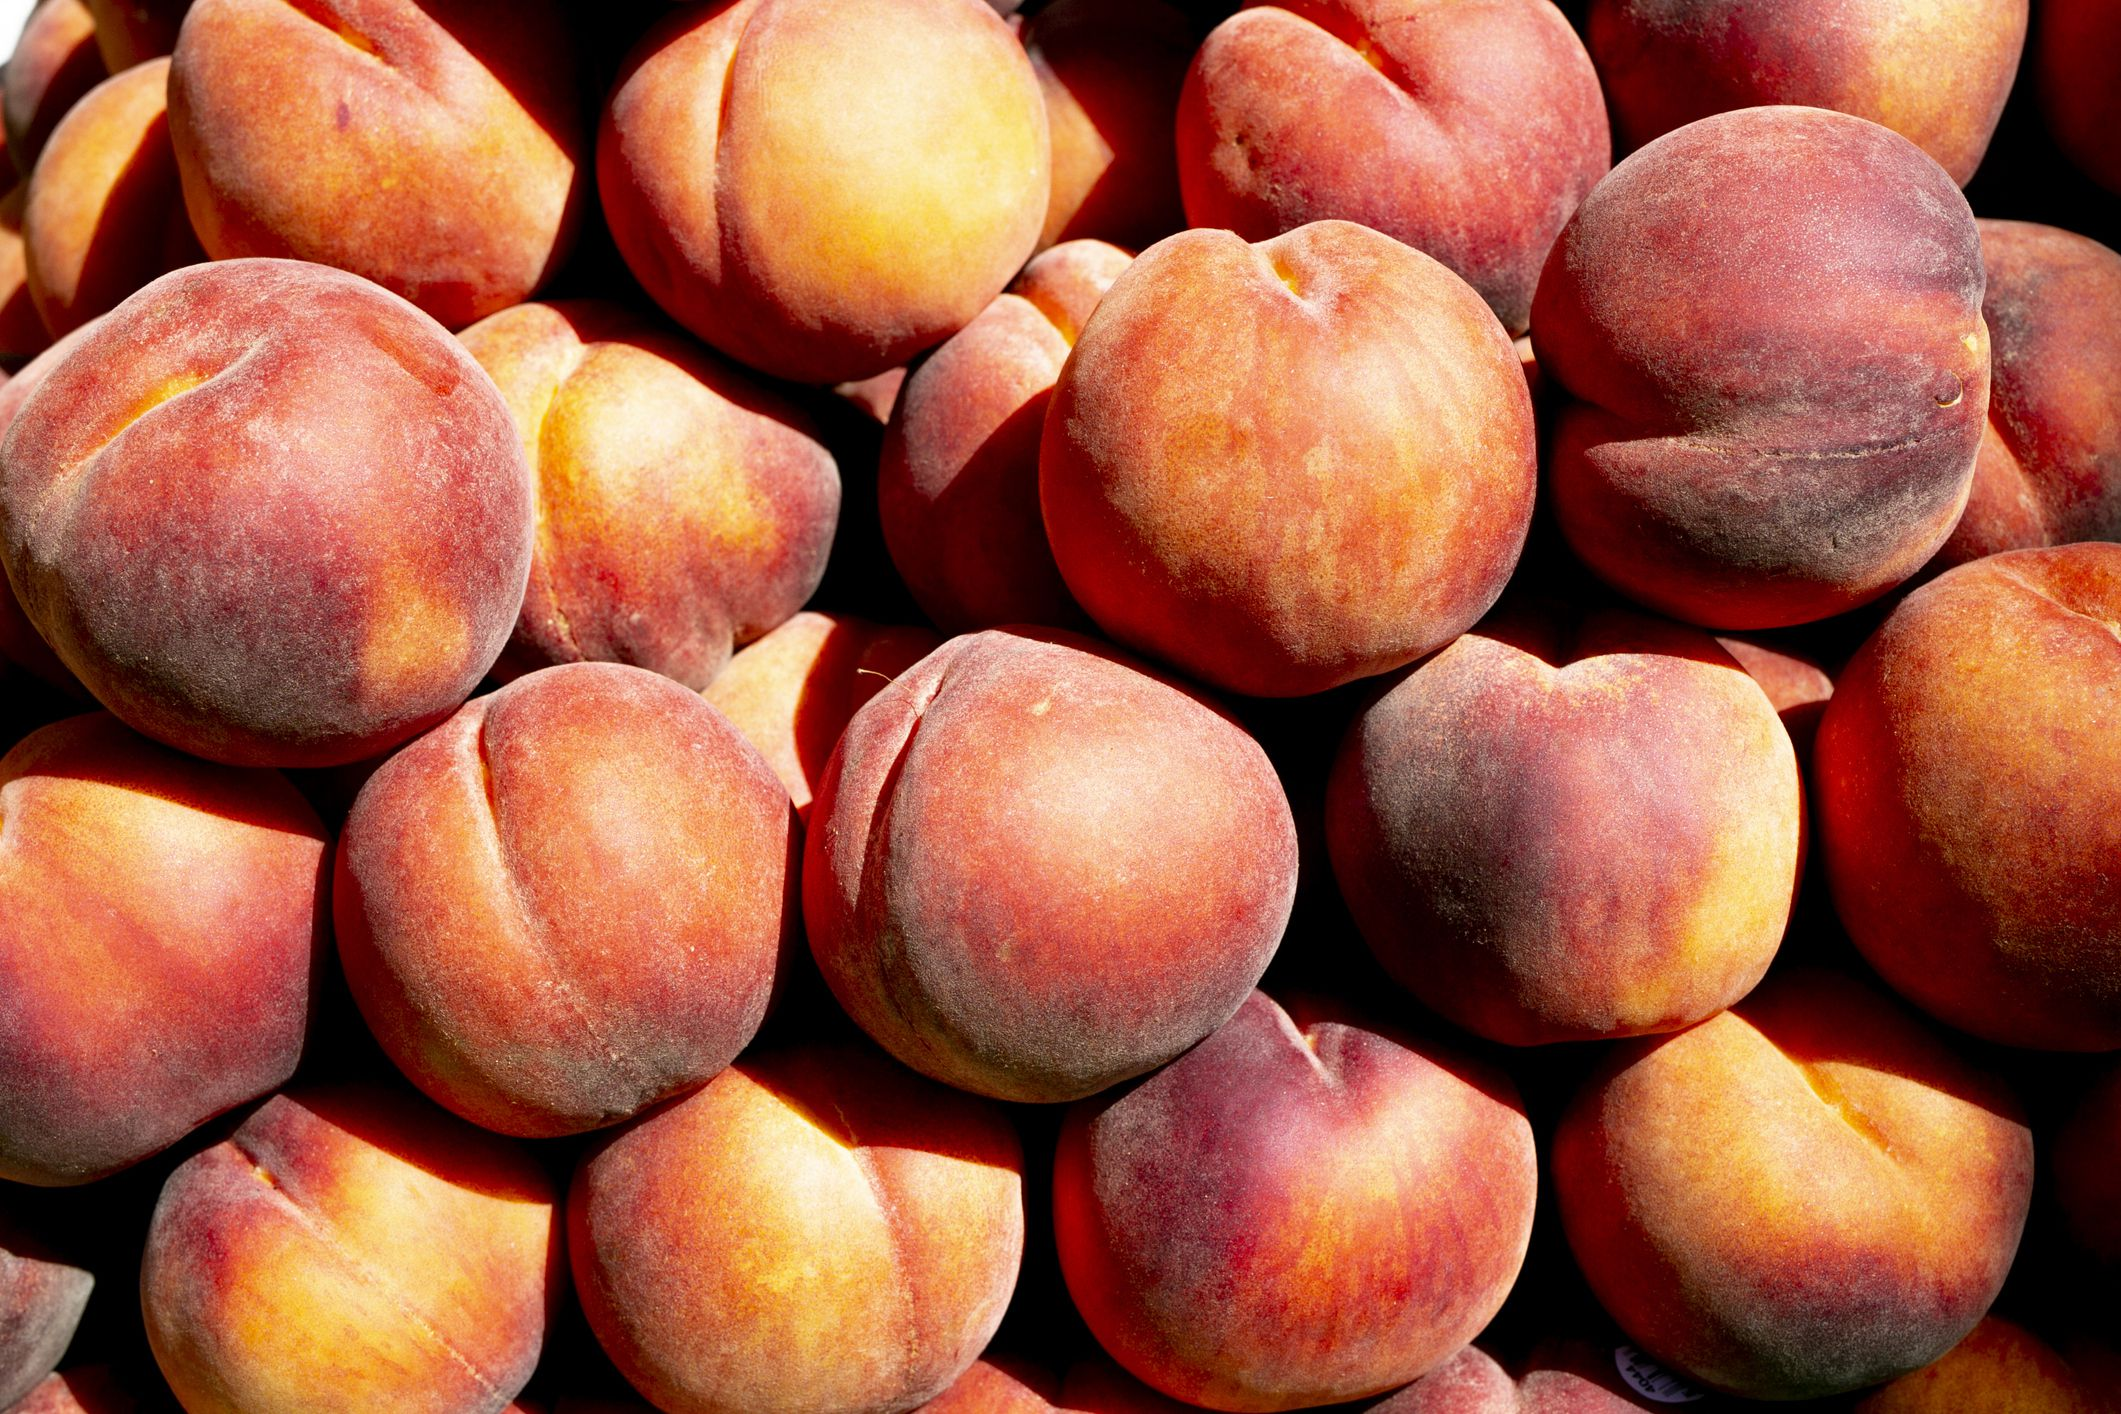 Georgia Seasonal Fruits And Vegetables